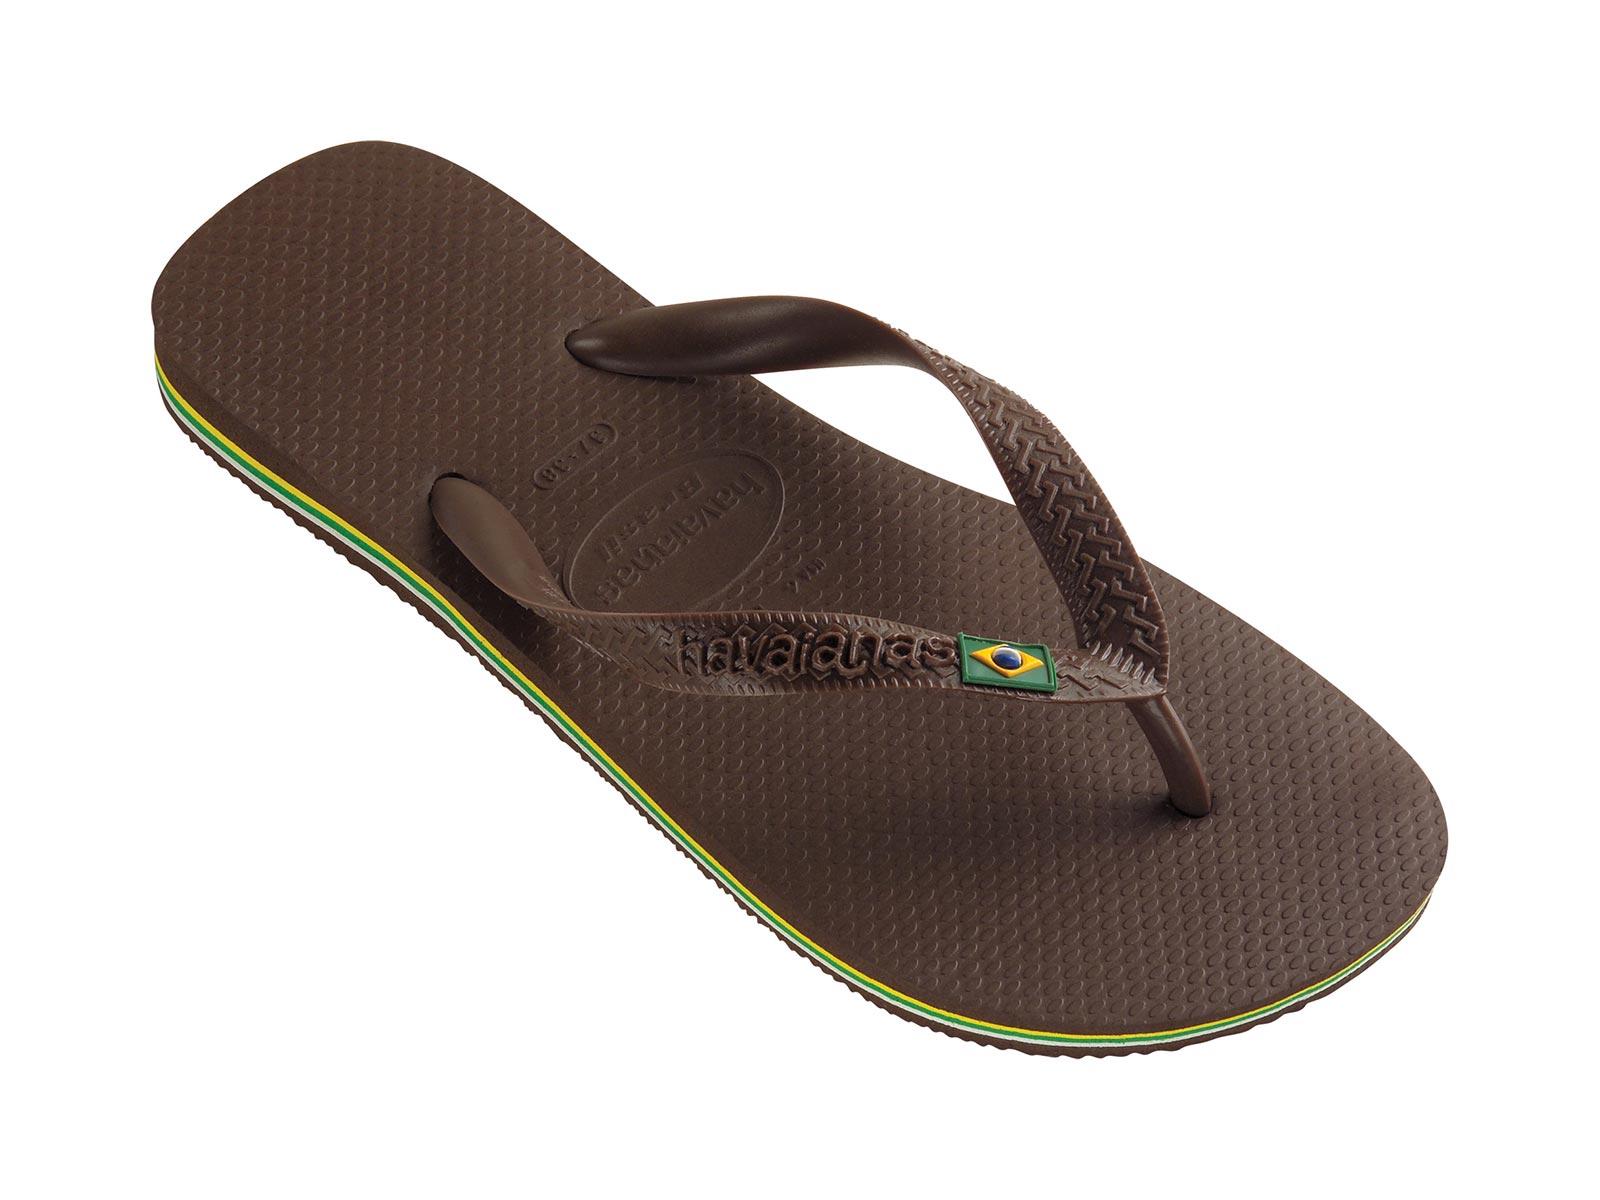 30ca7a15e93b4 Flip Flops In A Classic Dark Brown - Havaianas Brasil Dark Brown ...